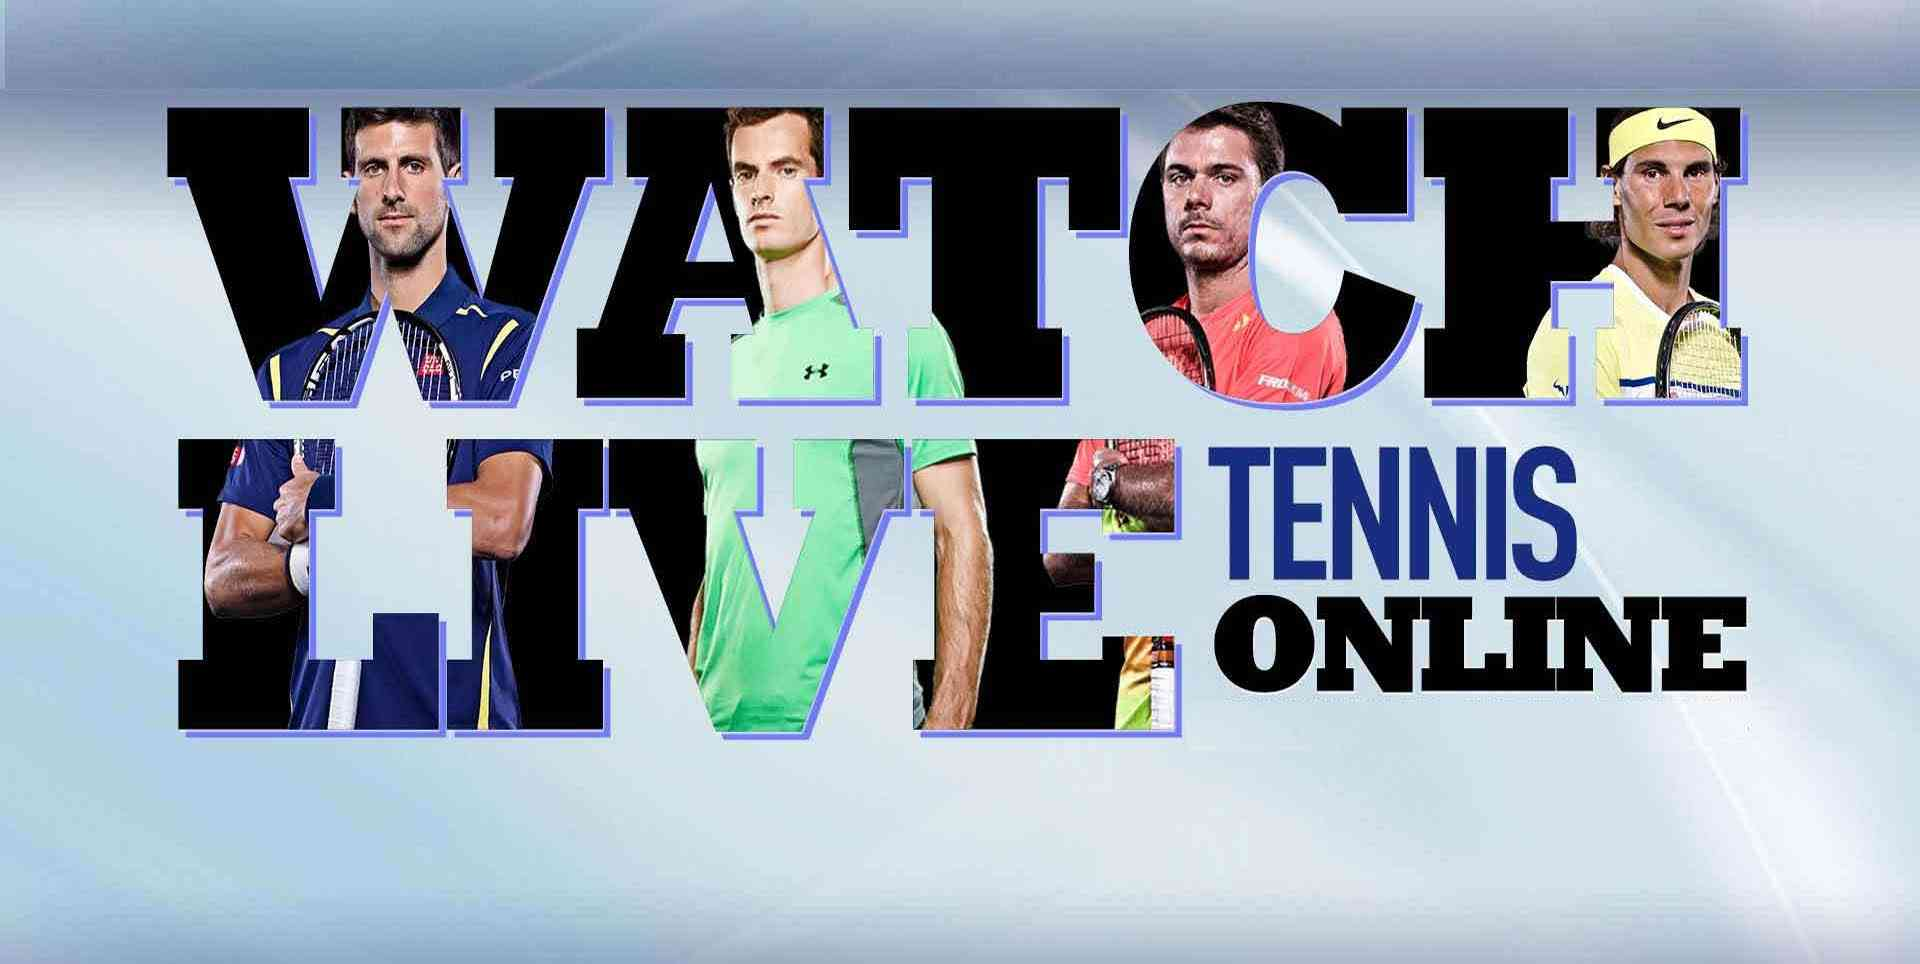 Watch T. Haas vs G. Dimitrov Mens Singles Quarterfinals Online 2013